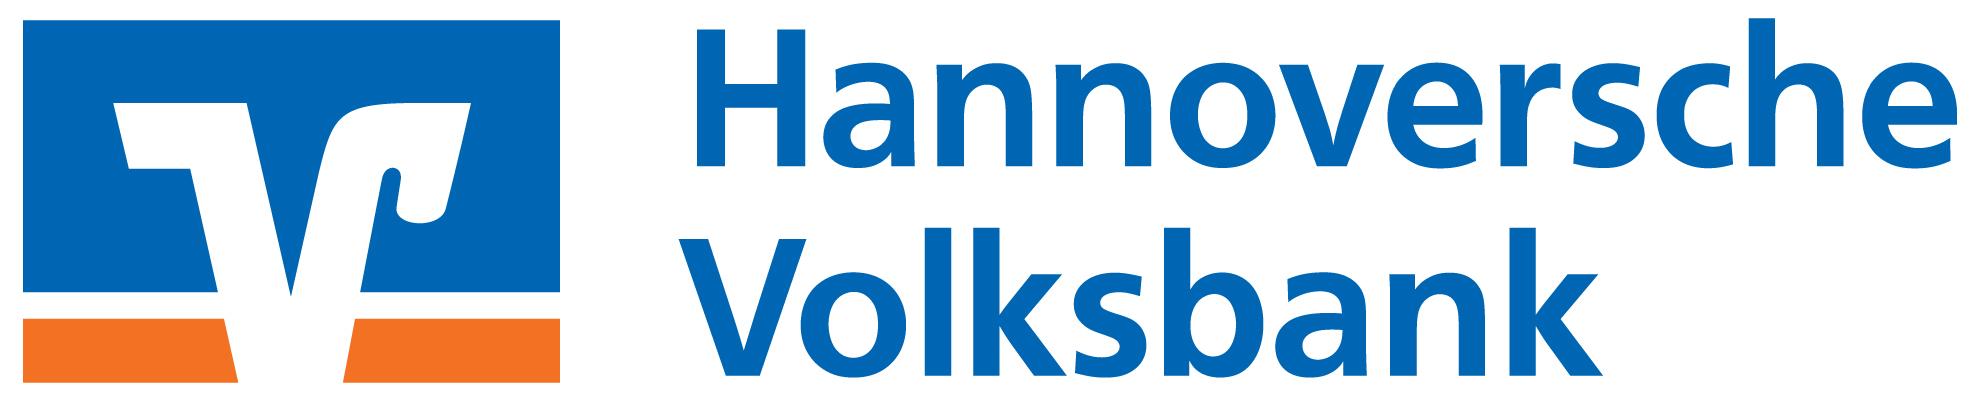 Hannoversche Volksbank eG KompetenzCenter Seelze